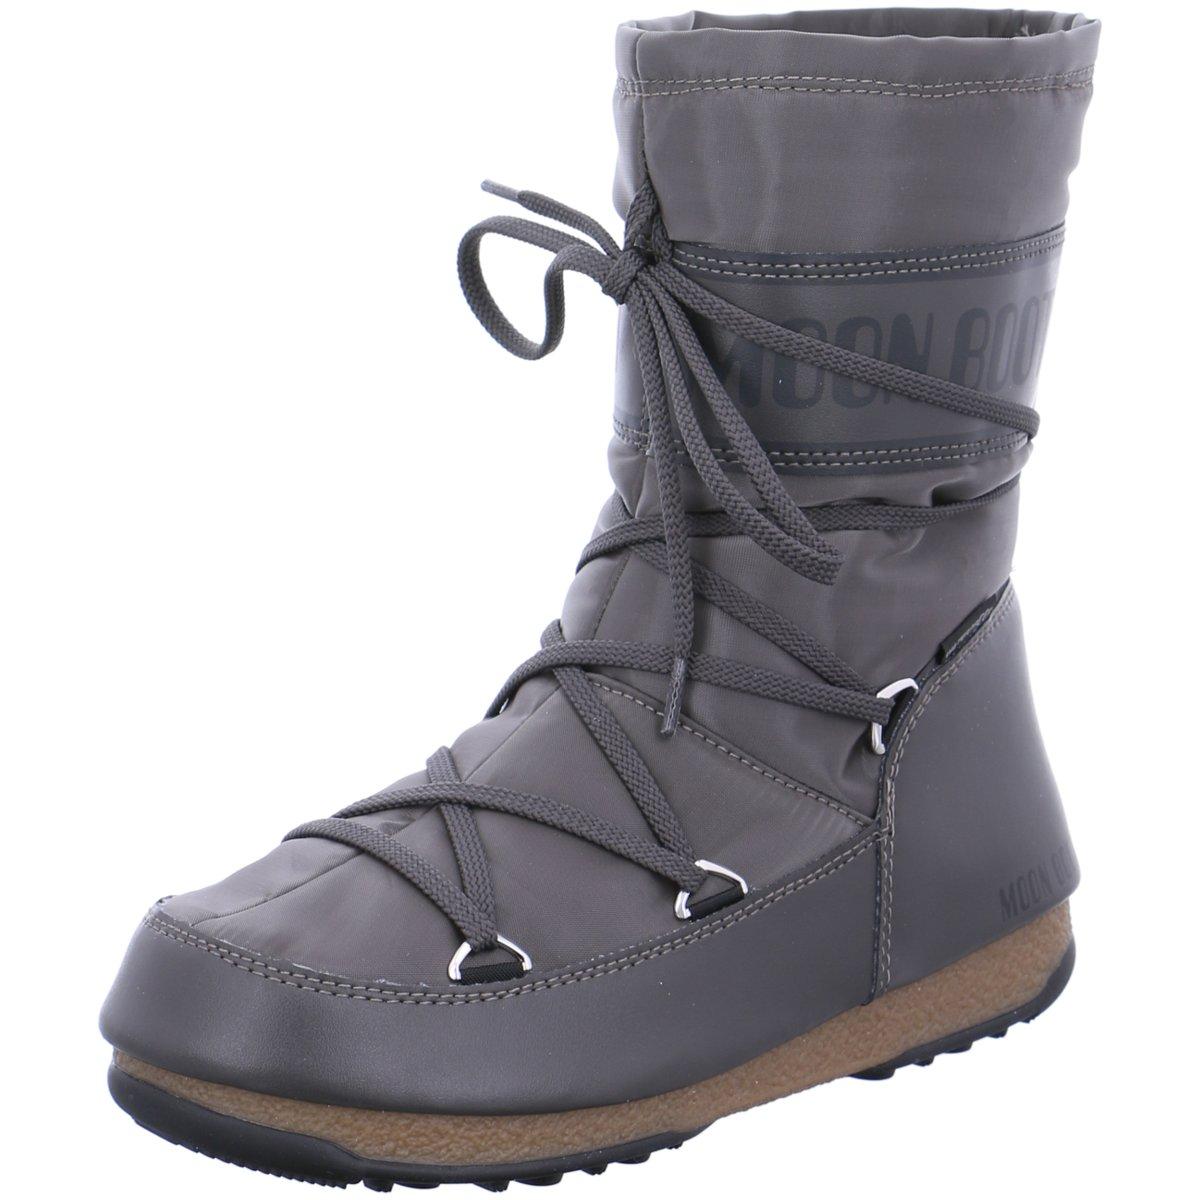 NEU Moon Boot Damen Stiefeletten Soft Shade mid 24004600-002 grau 398041